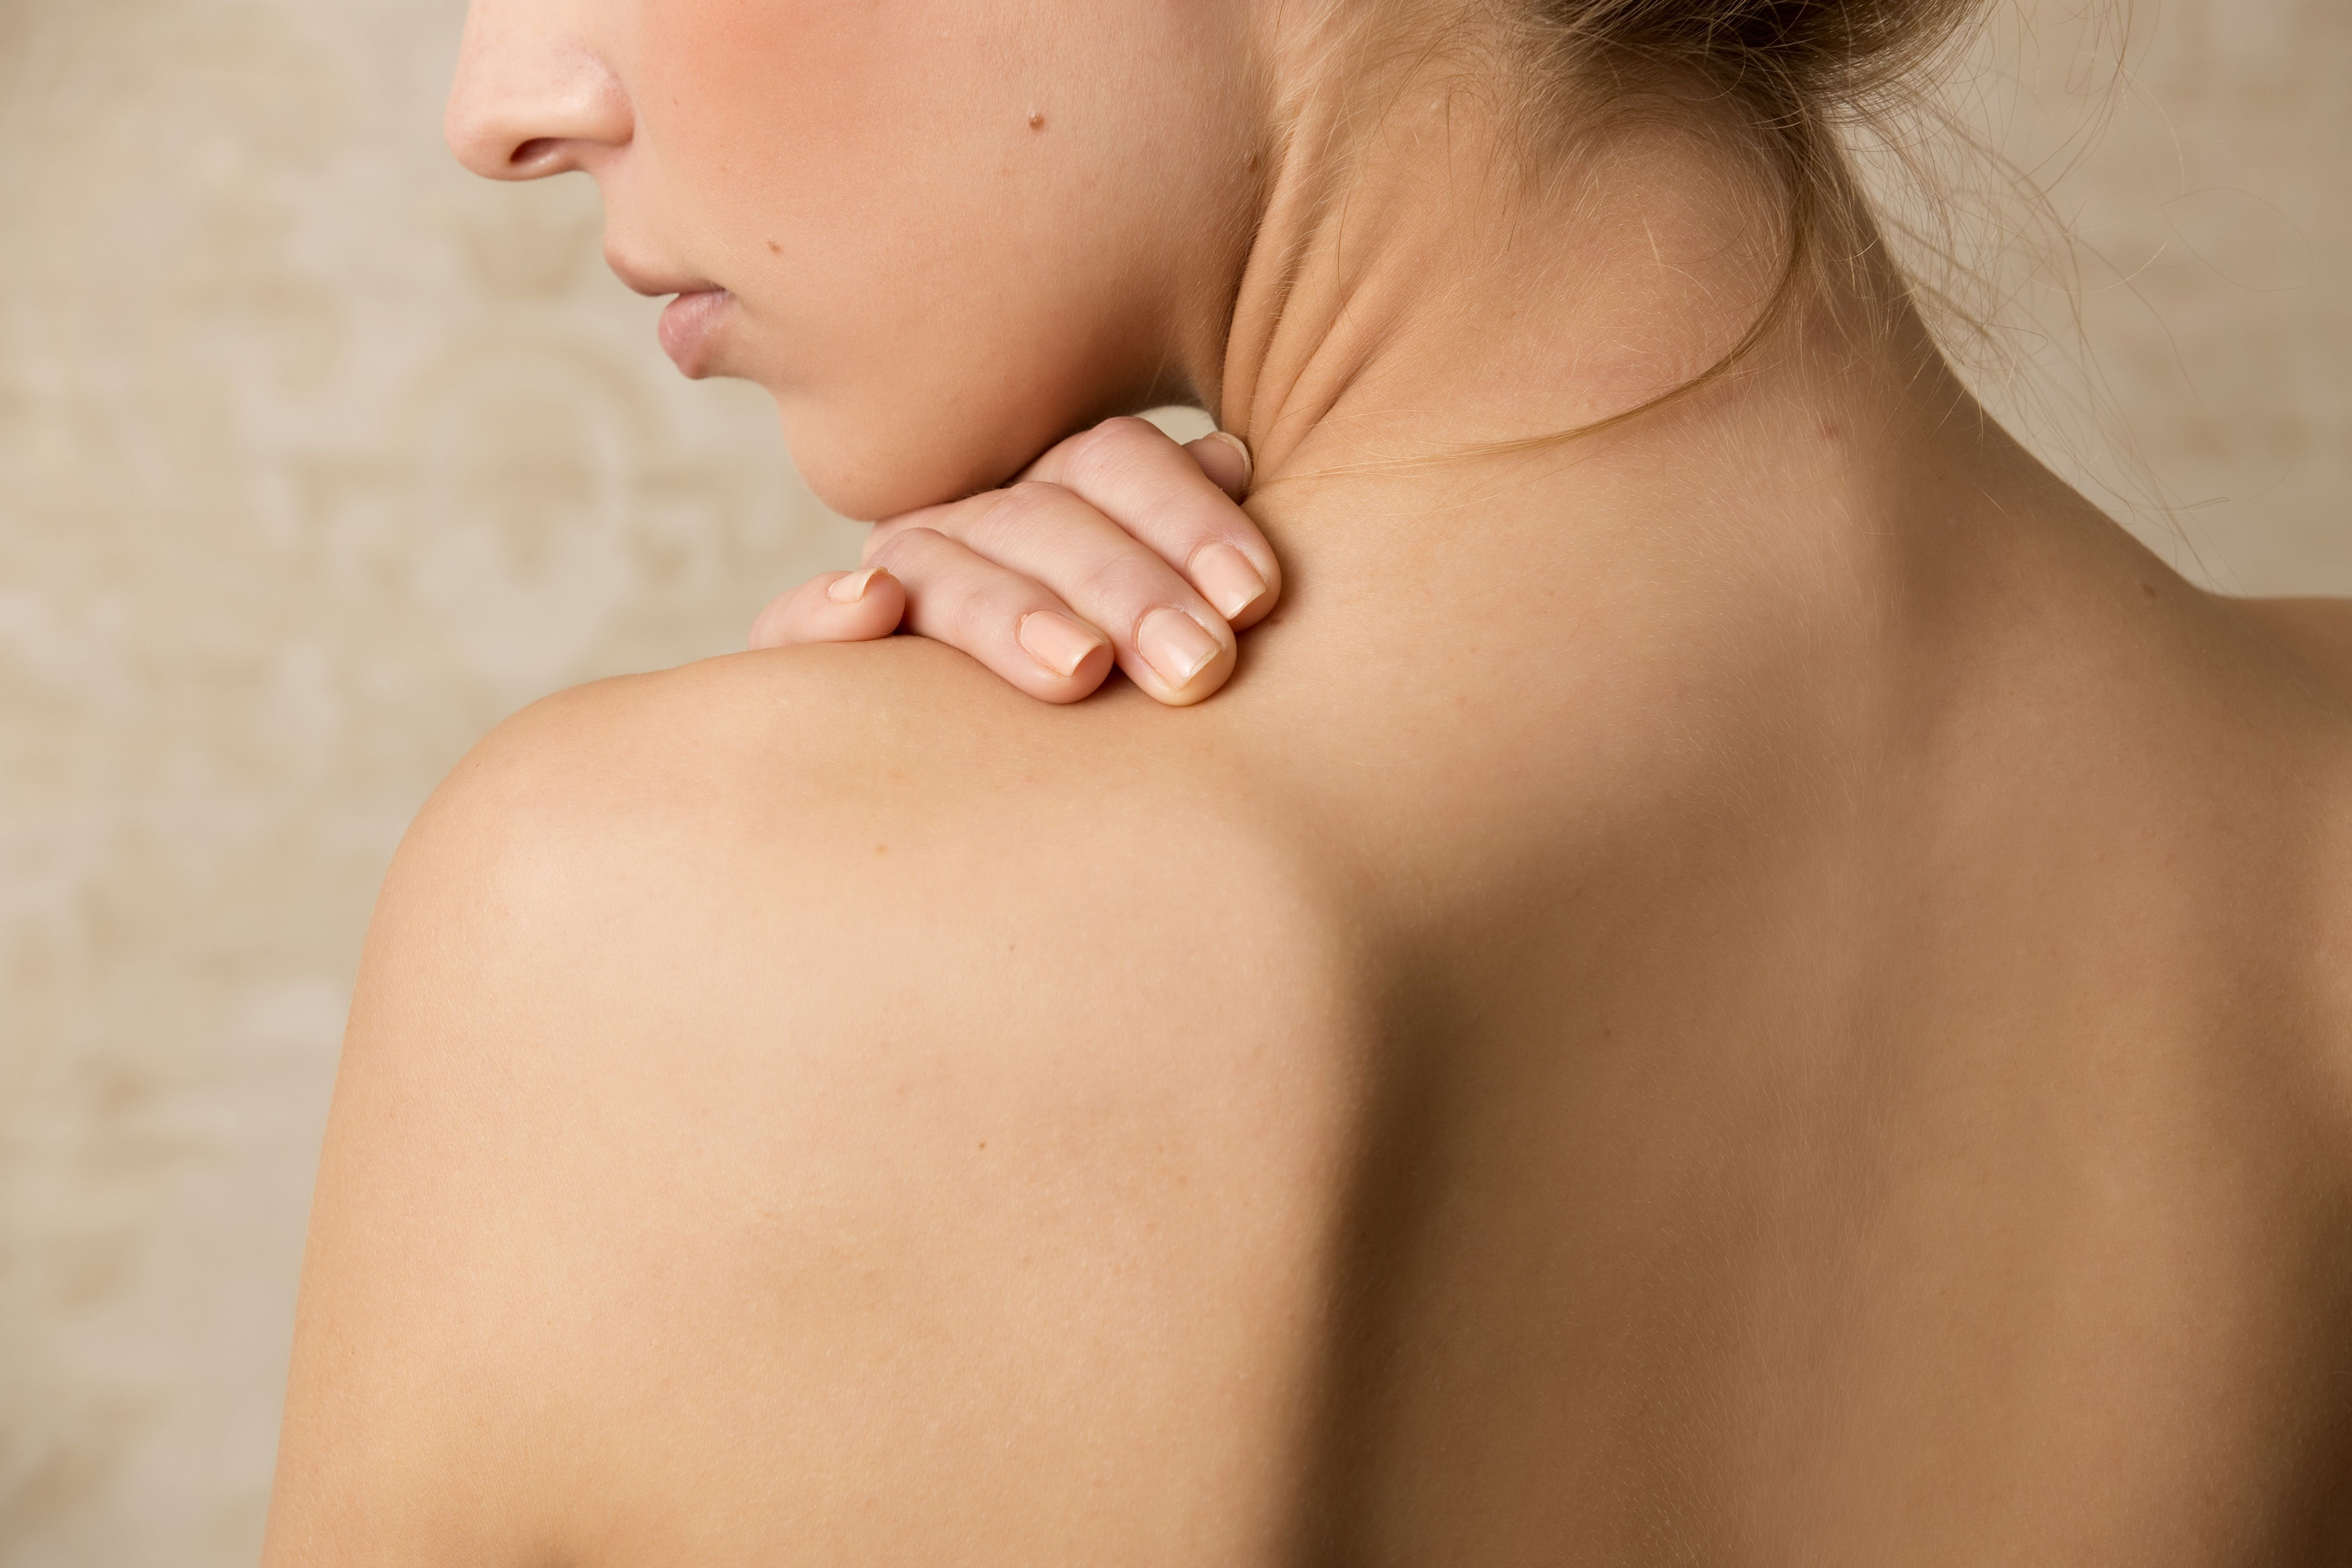 spots on my back after gym